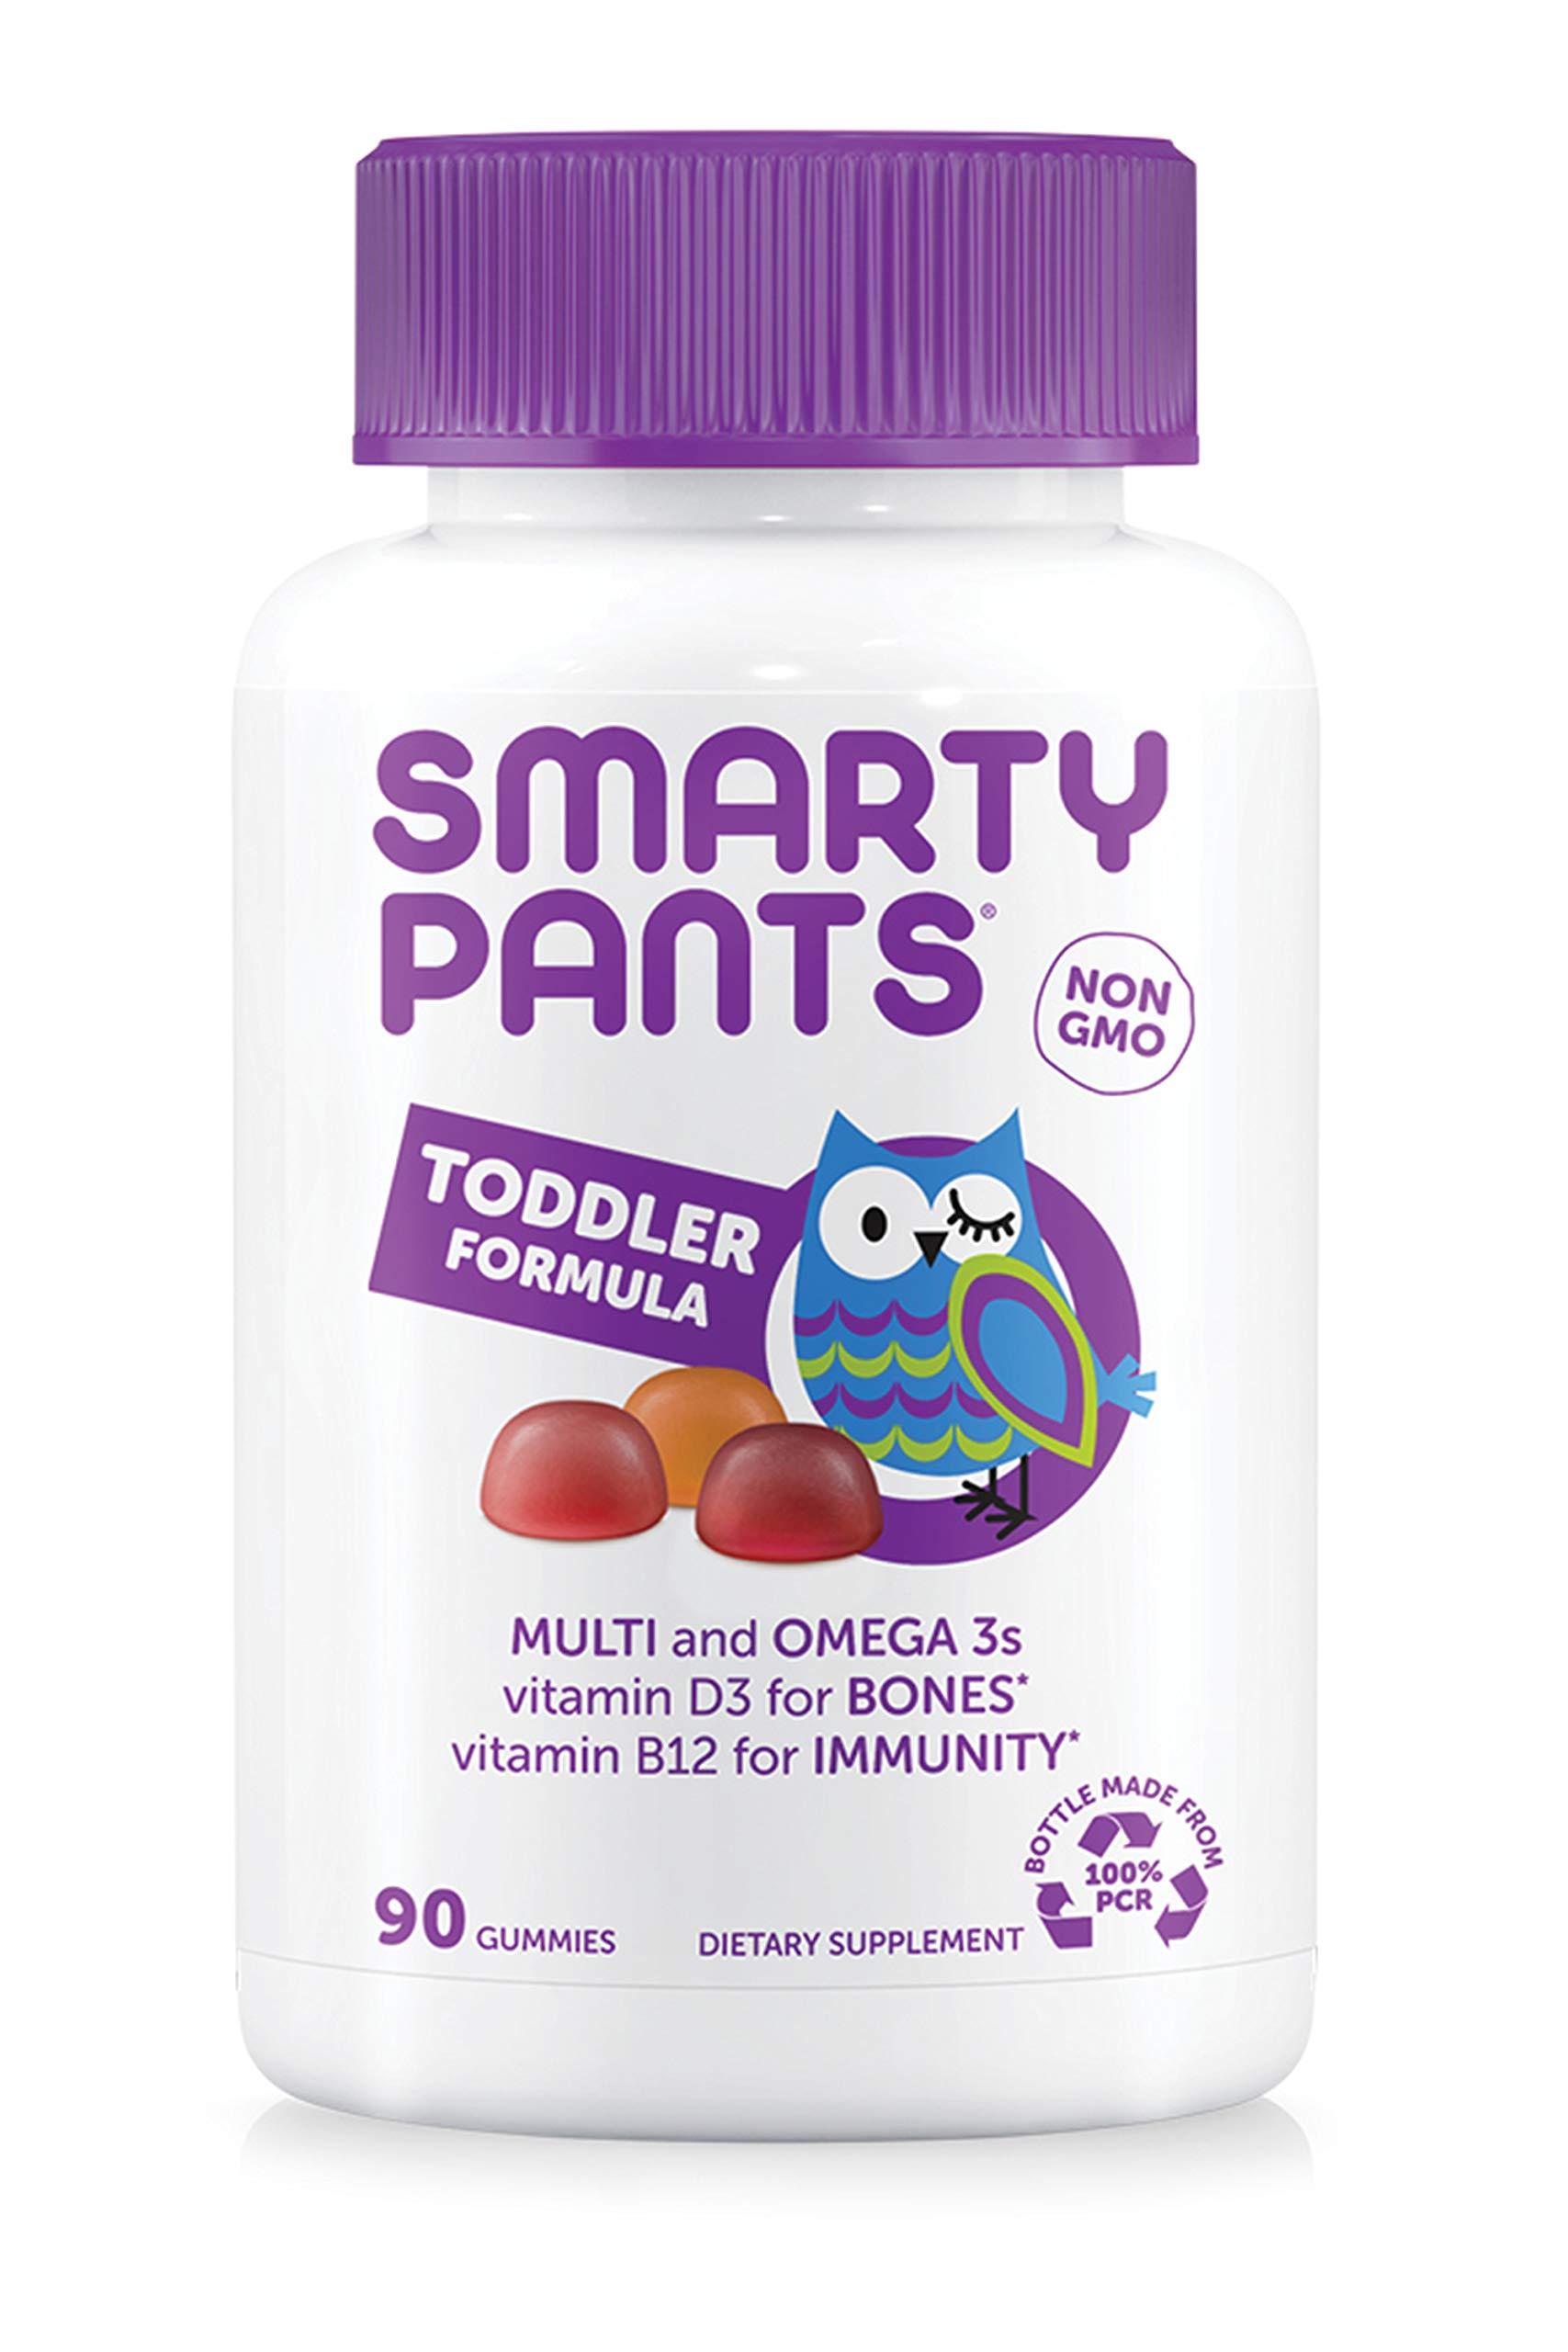 SmartyPants Toddler Formula Daily Gummy Multivitamin: Vitamin C, D3, & Zinc for Immunity, Gluten Free, Omega 3 Fish Oil (DHA/EPA), Antiviral, Vitamin B6, Methyl B12, 90 Count (30 Day Supply)